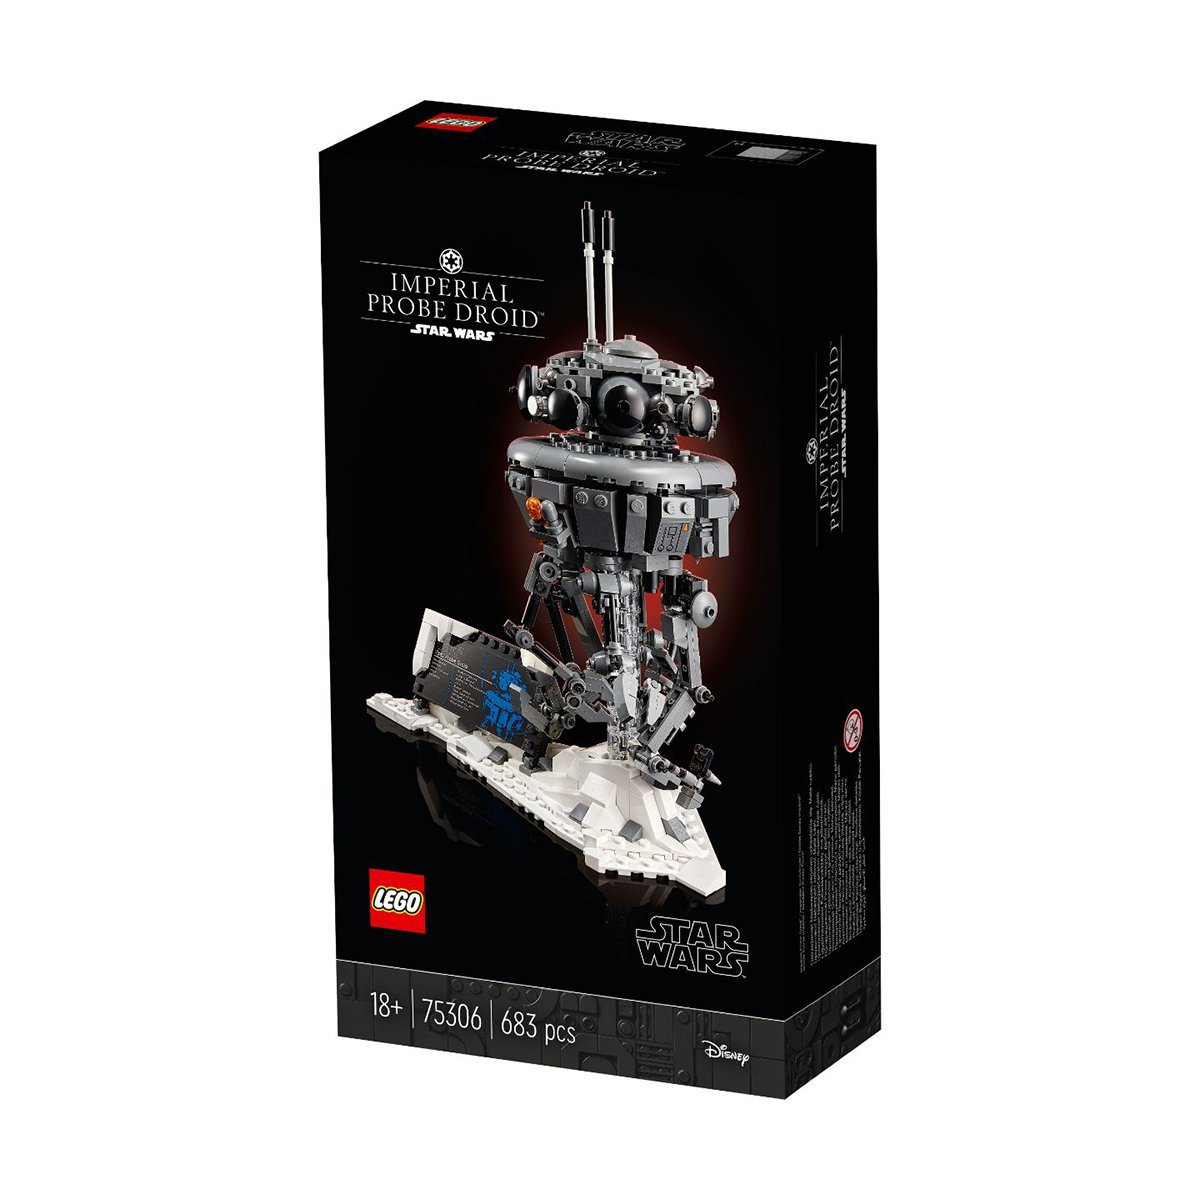 LEGO® Star Wars - Imperial Probe Droid (75306)